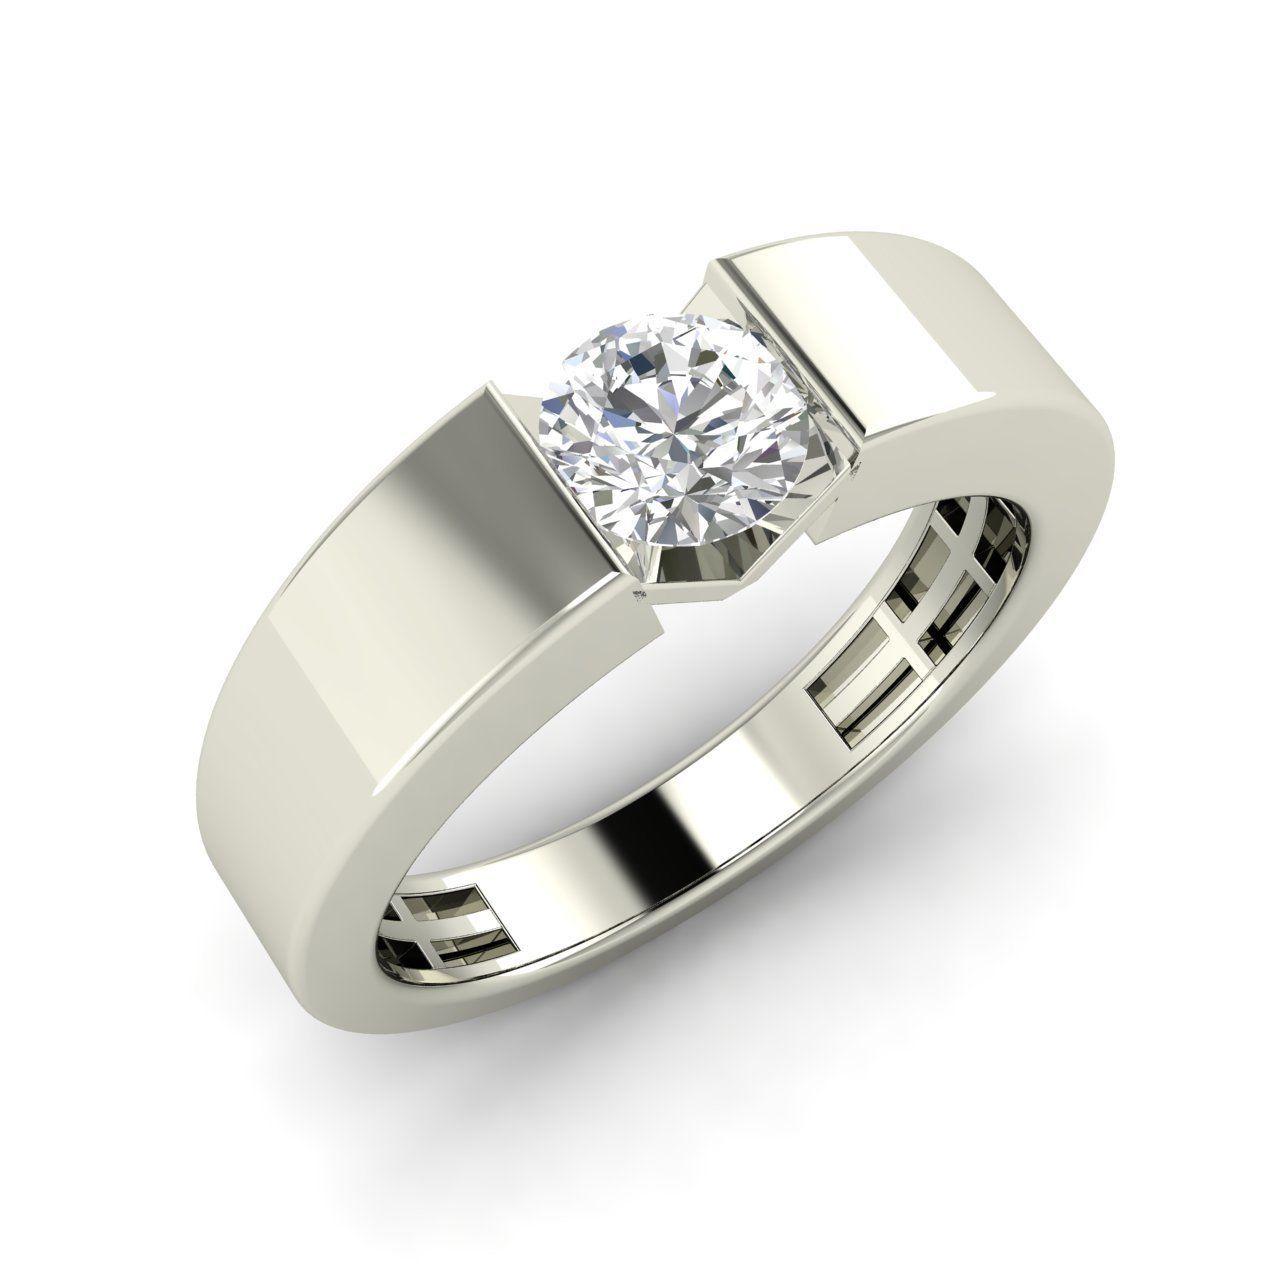 2 Carat Round Cut Natural White Topaz Mens Wedding  Engagement Band Ring (512)